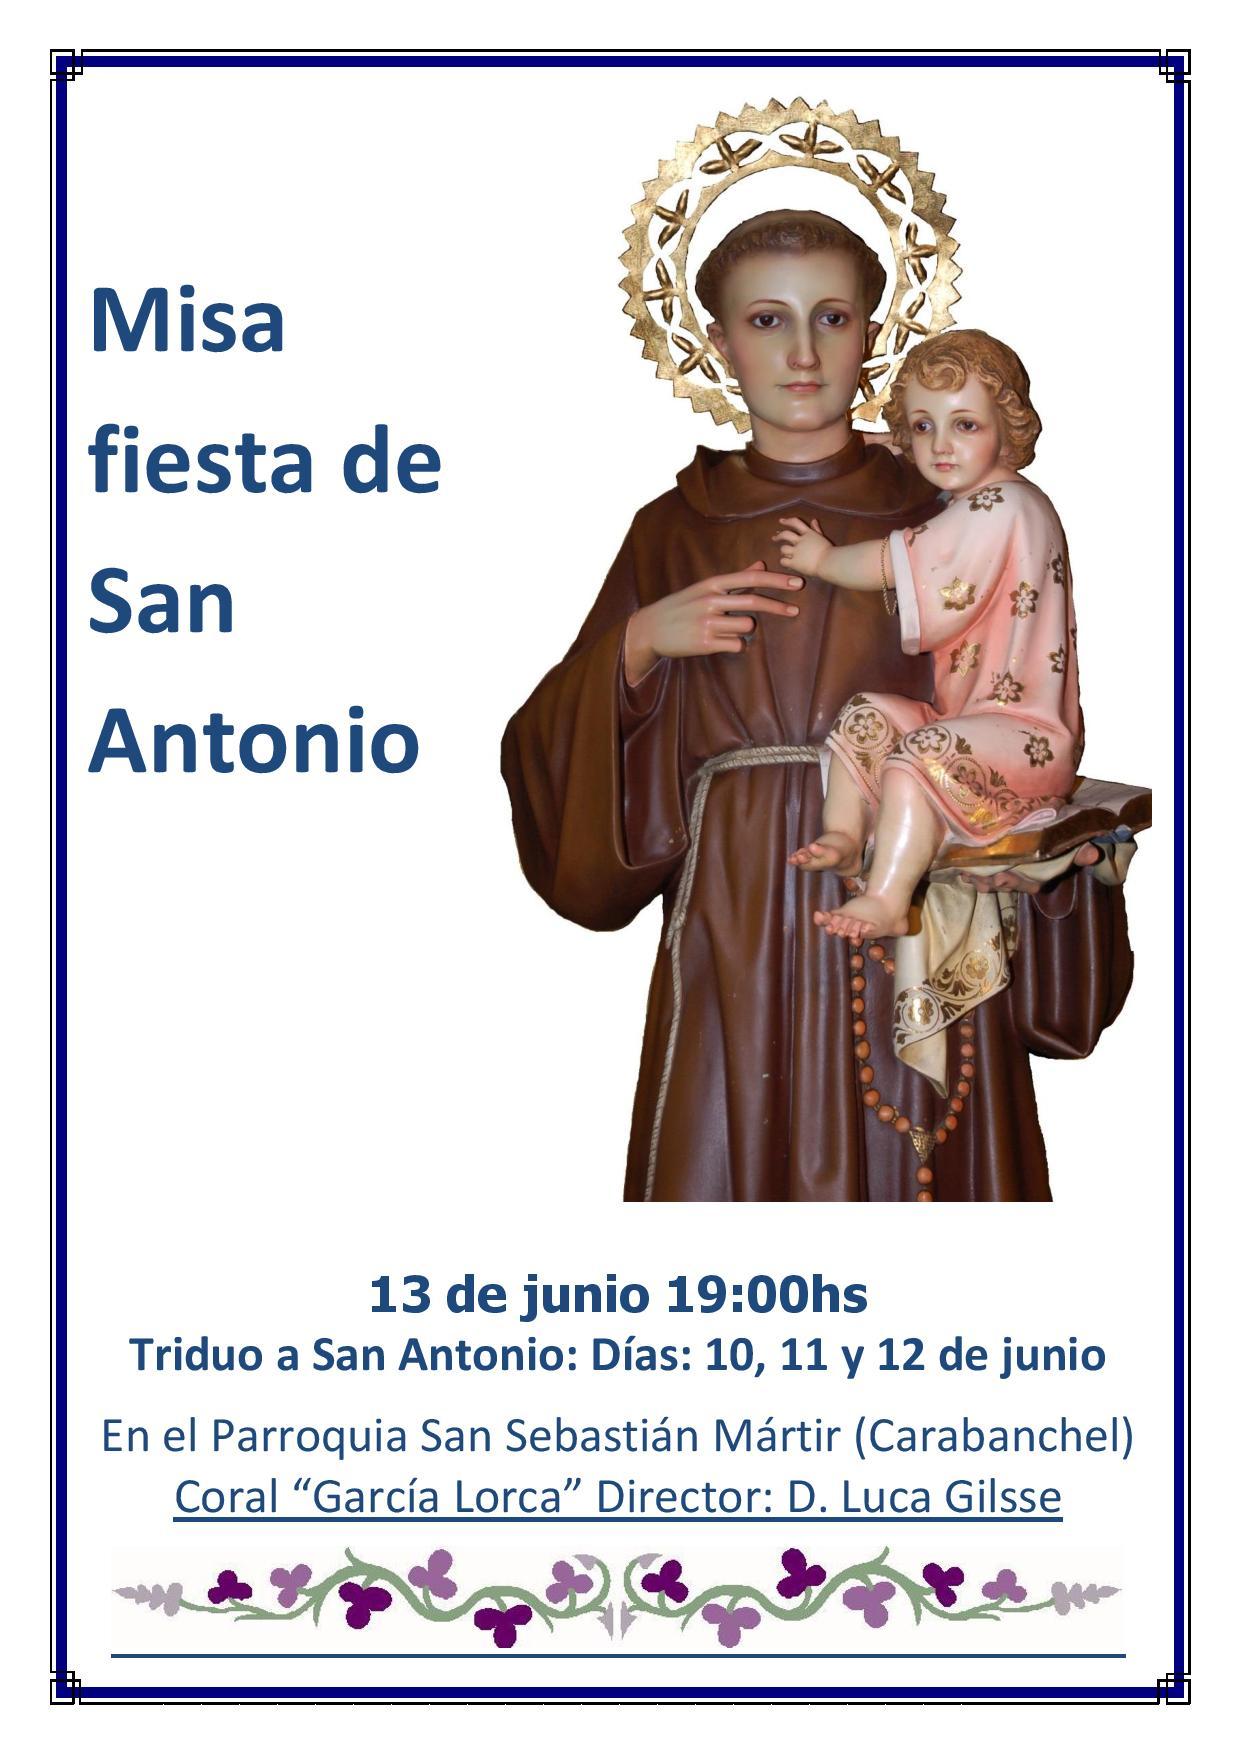 misa fiesta de san antonio 1-page-001